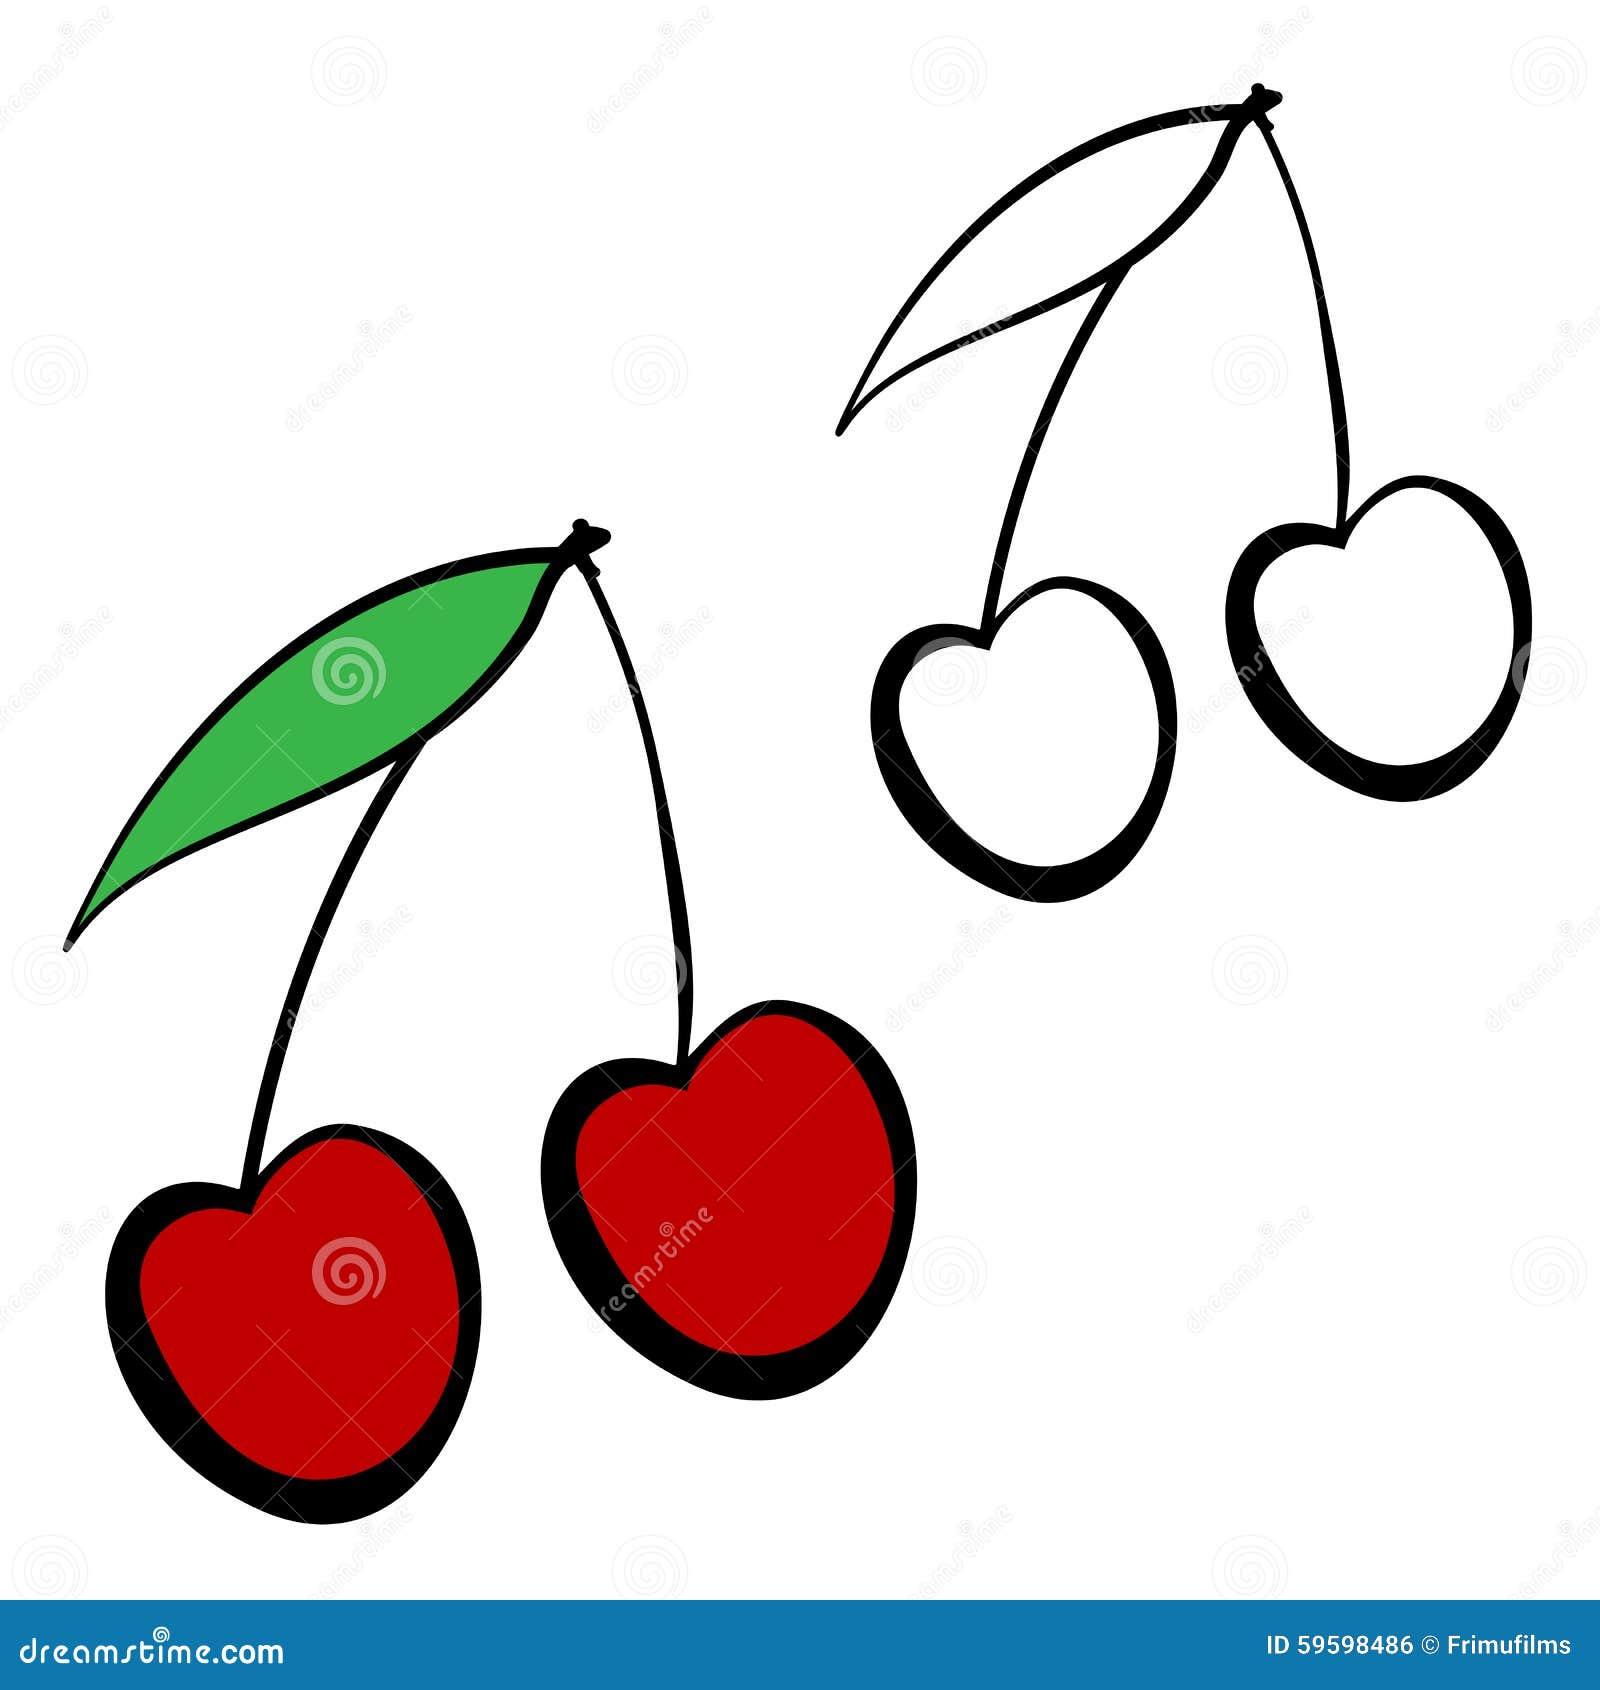 Red Cherry Web Design